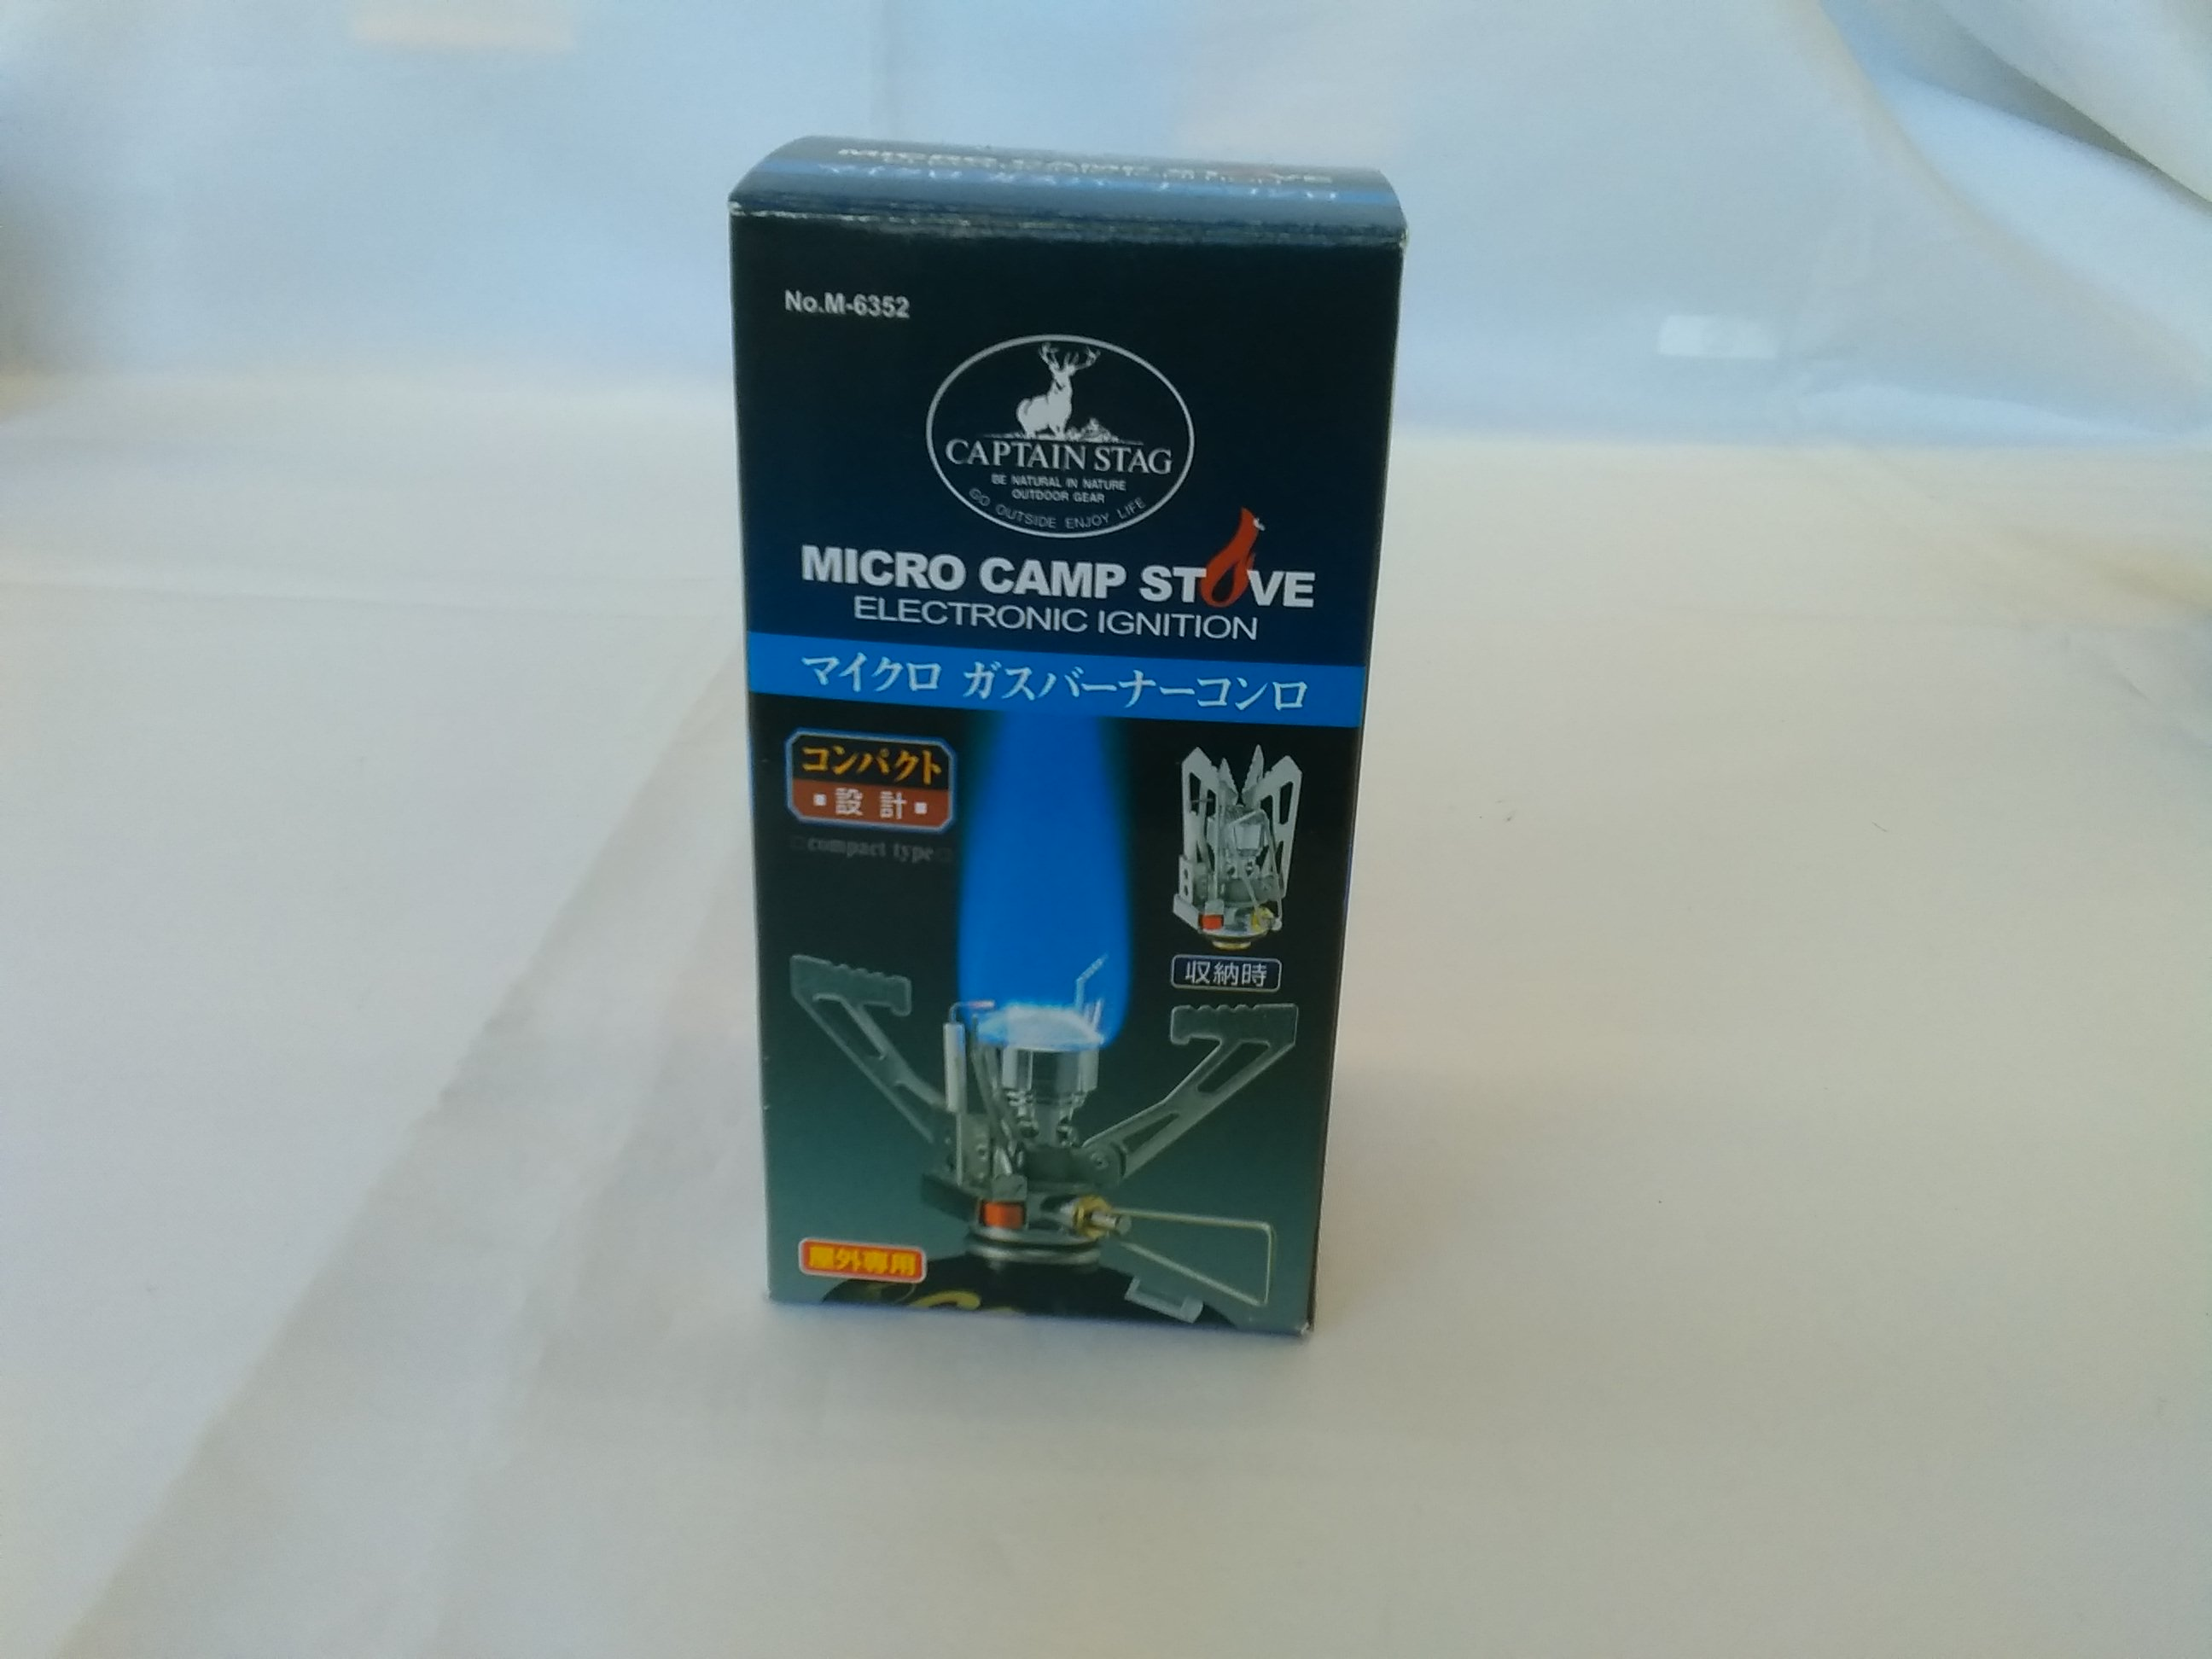 CAPTAIN STAGマイクロガスバーナーコンロ|CAPTAIN STAG ガスバーナーコンロ